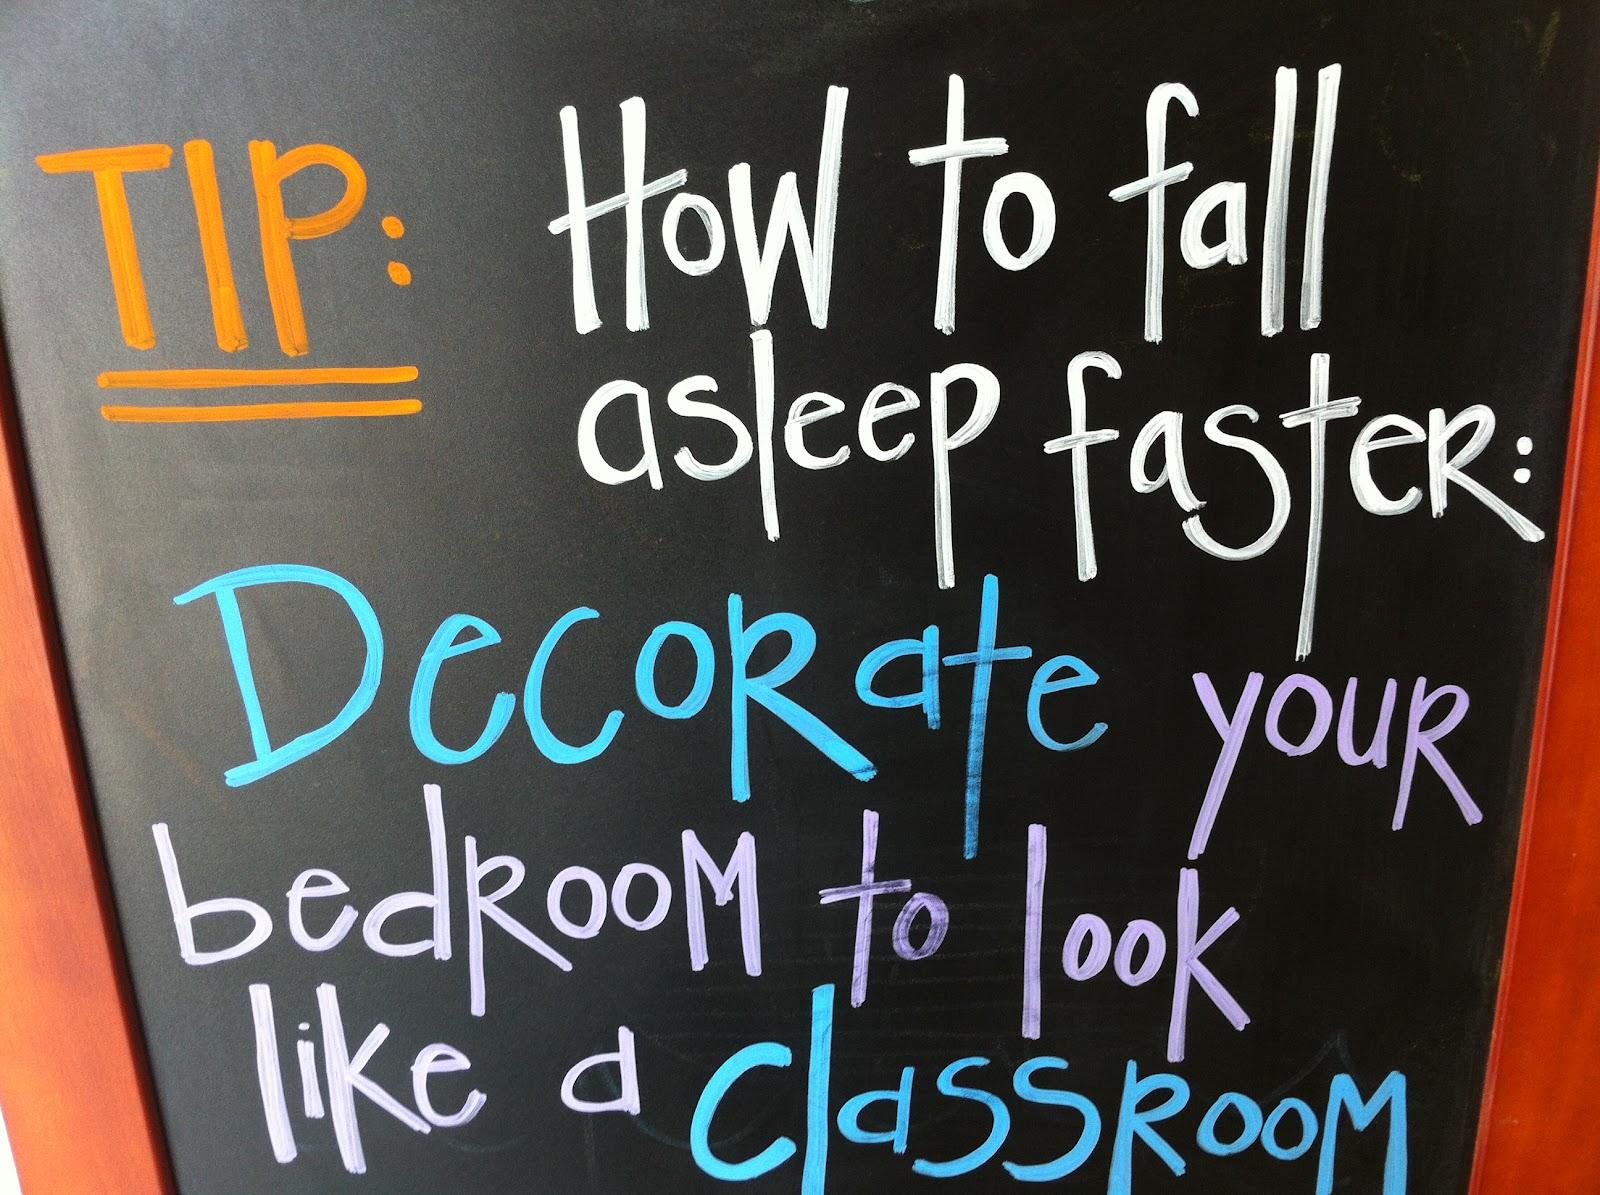 fall_asleep_faster.jpg